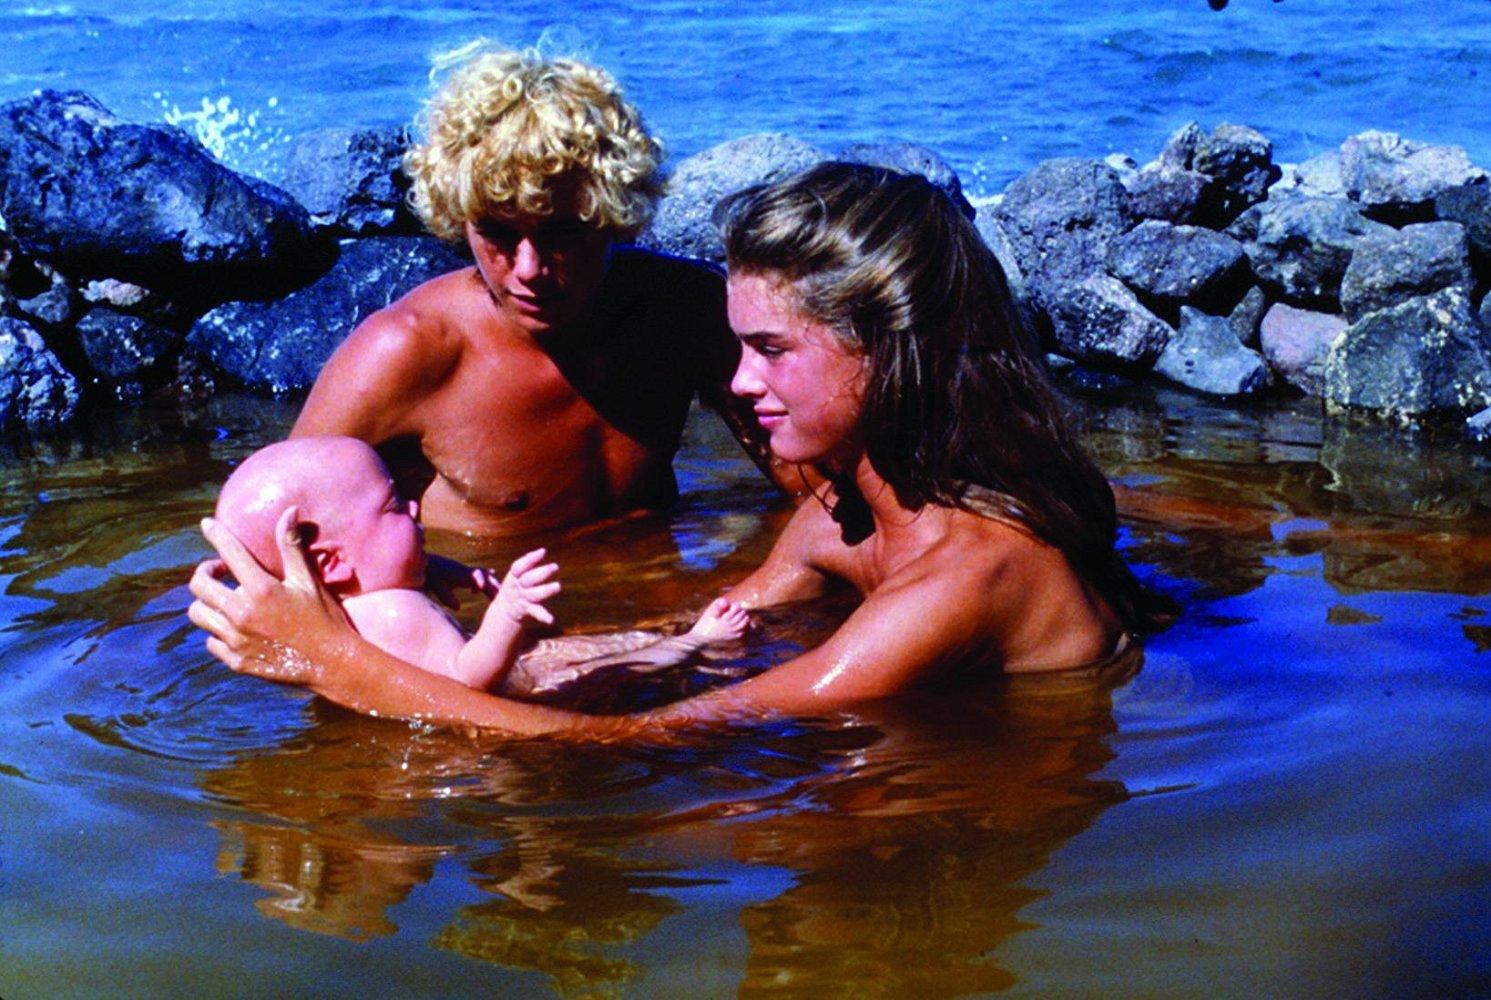 gioci erotici film erotici italiani anni 80